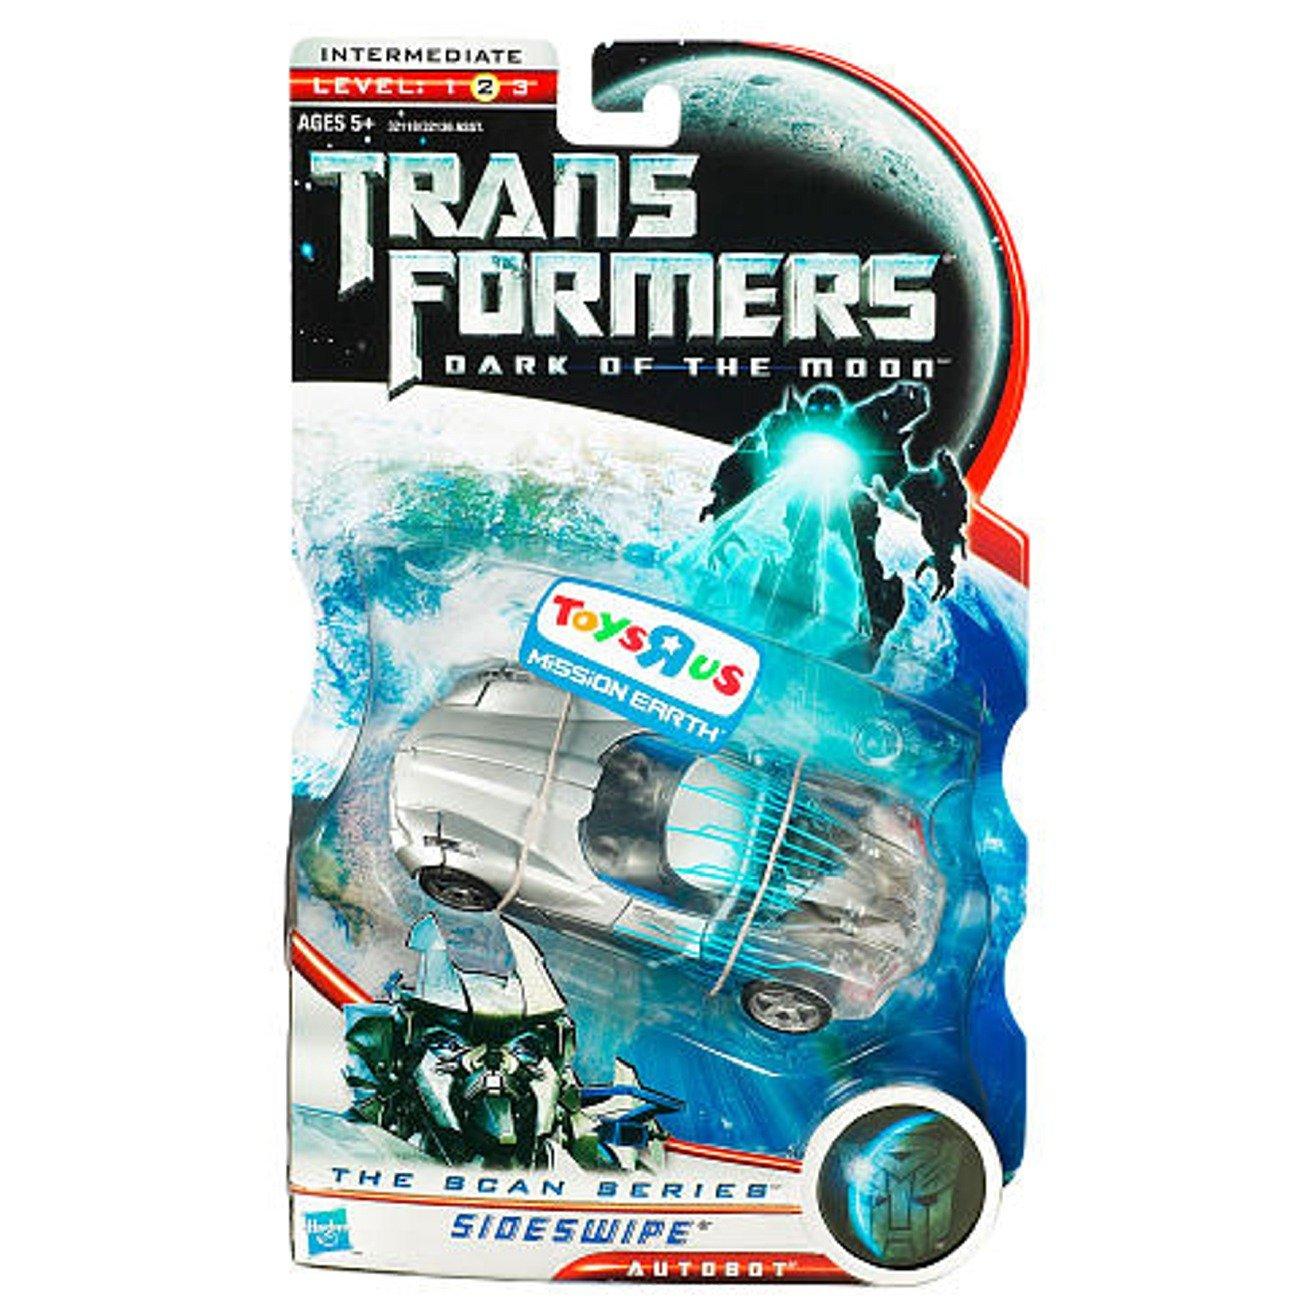 Transformers: Dark of the Moon – The Scan Series günstig bestellen